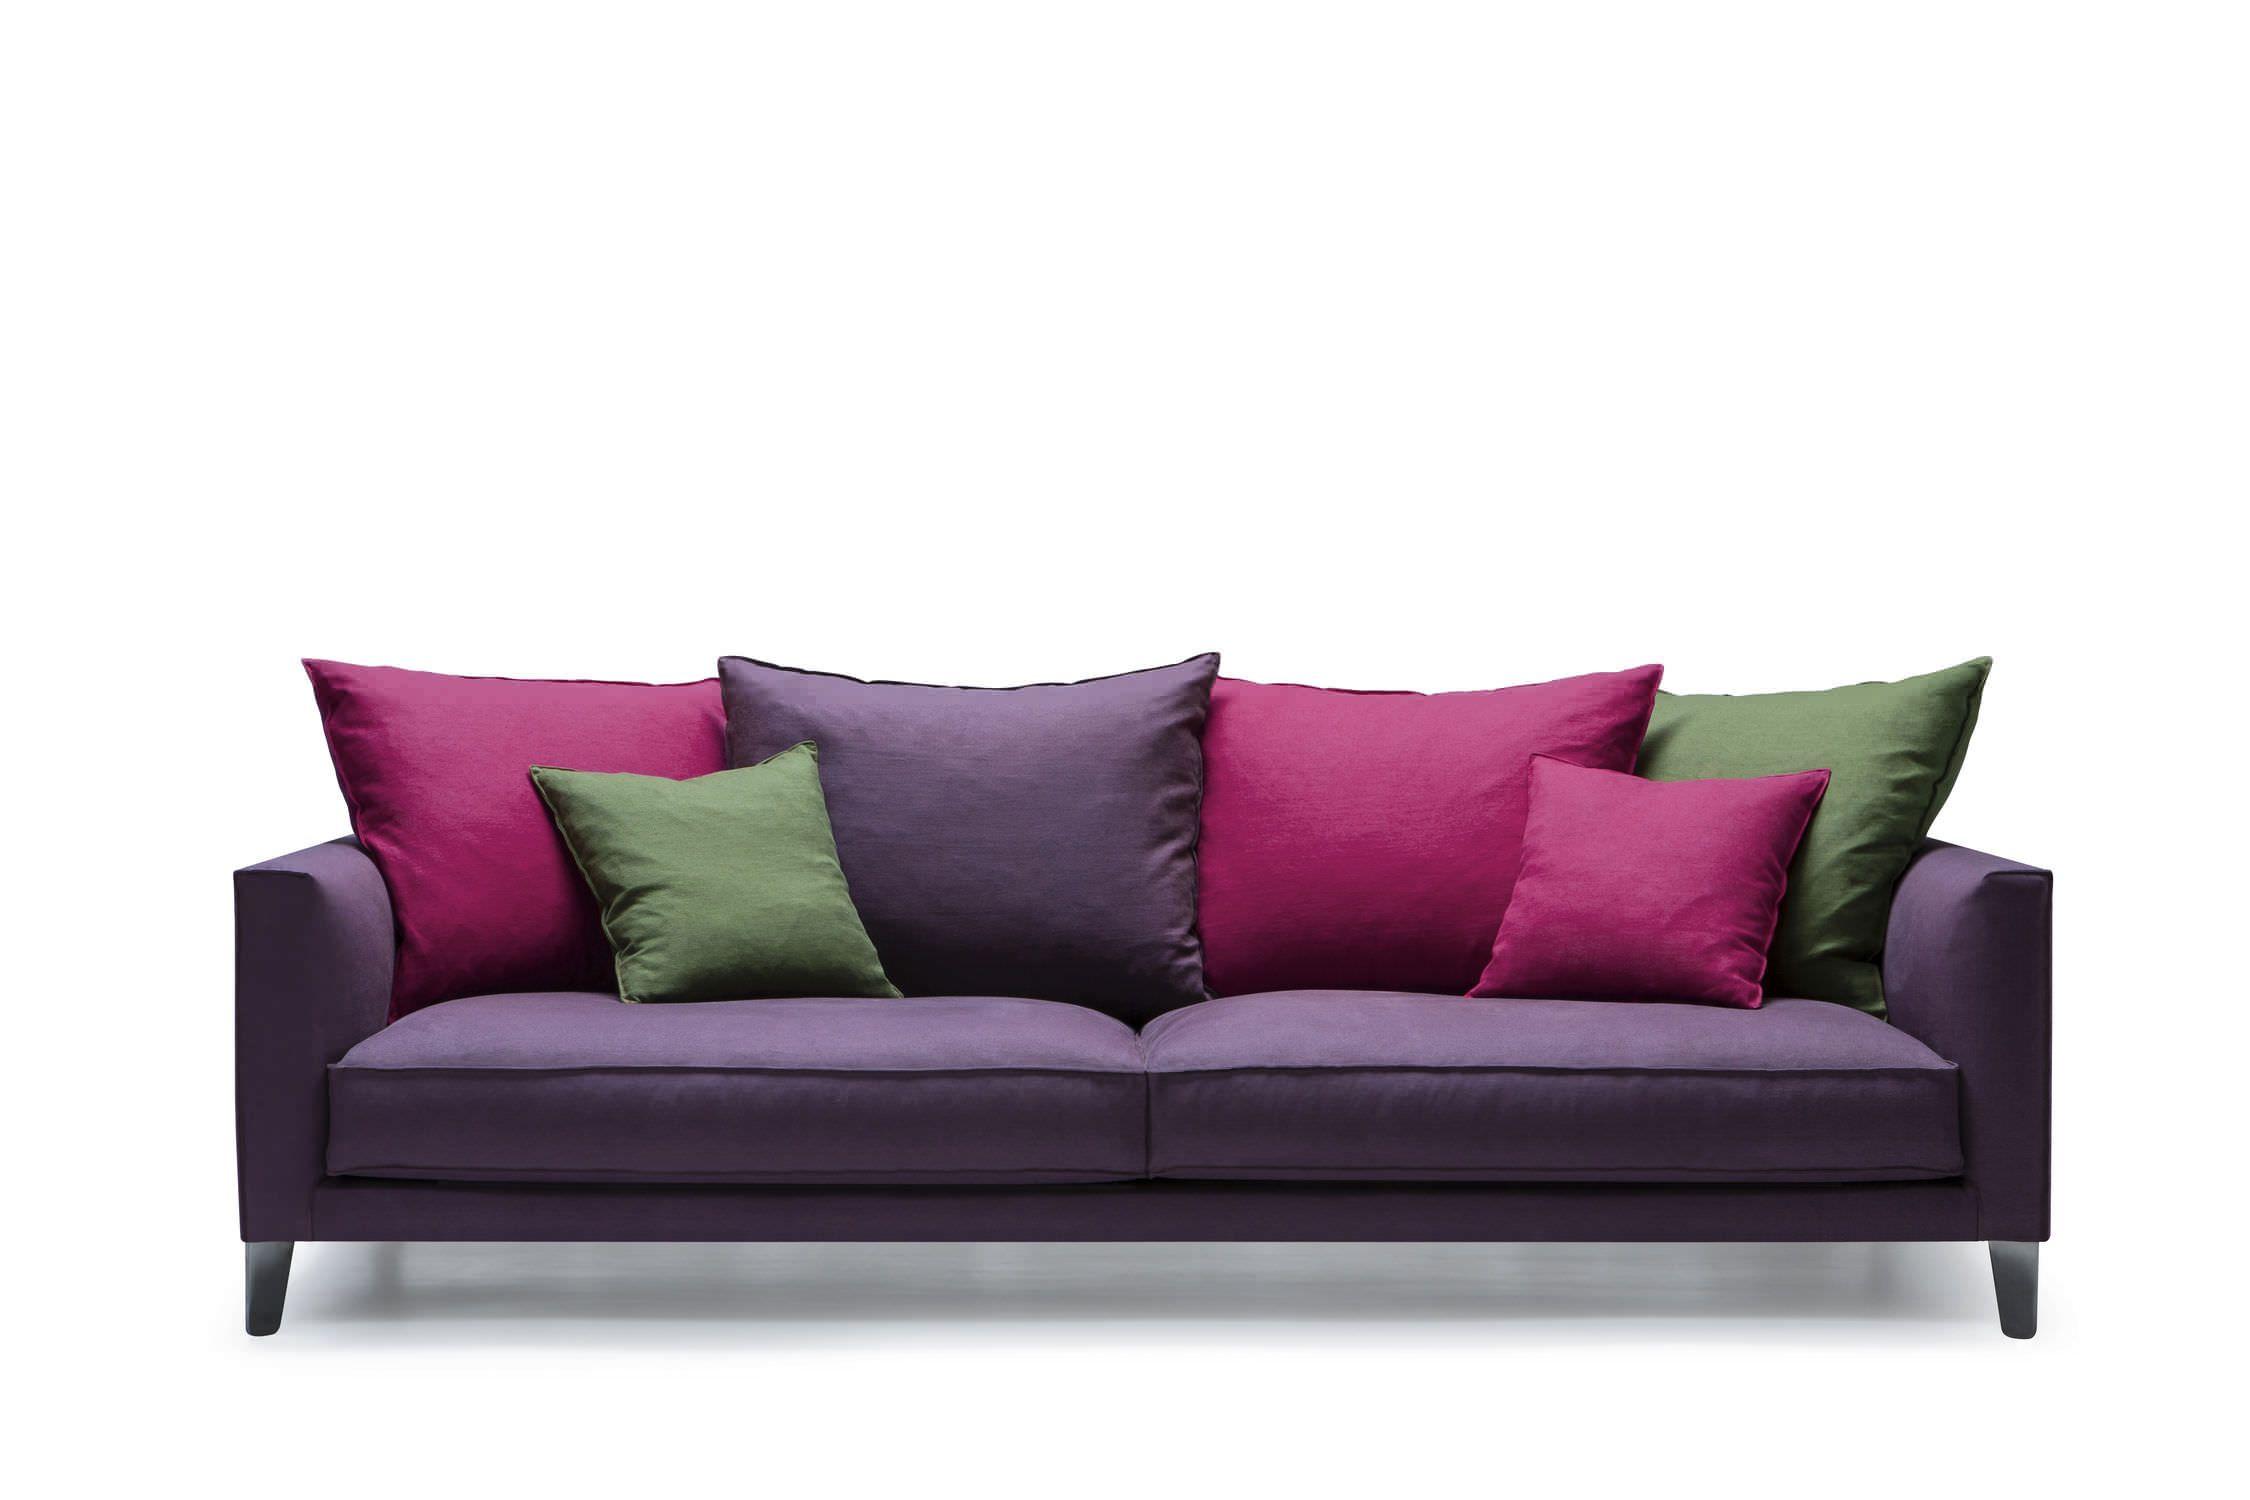 image gallery sofas modernos